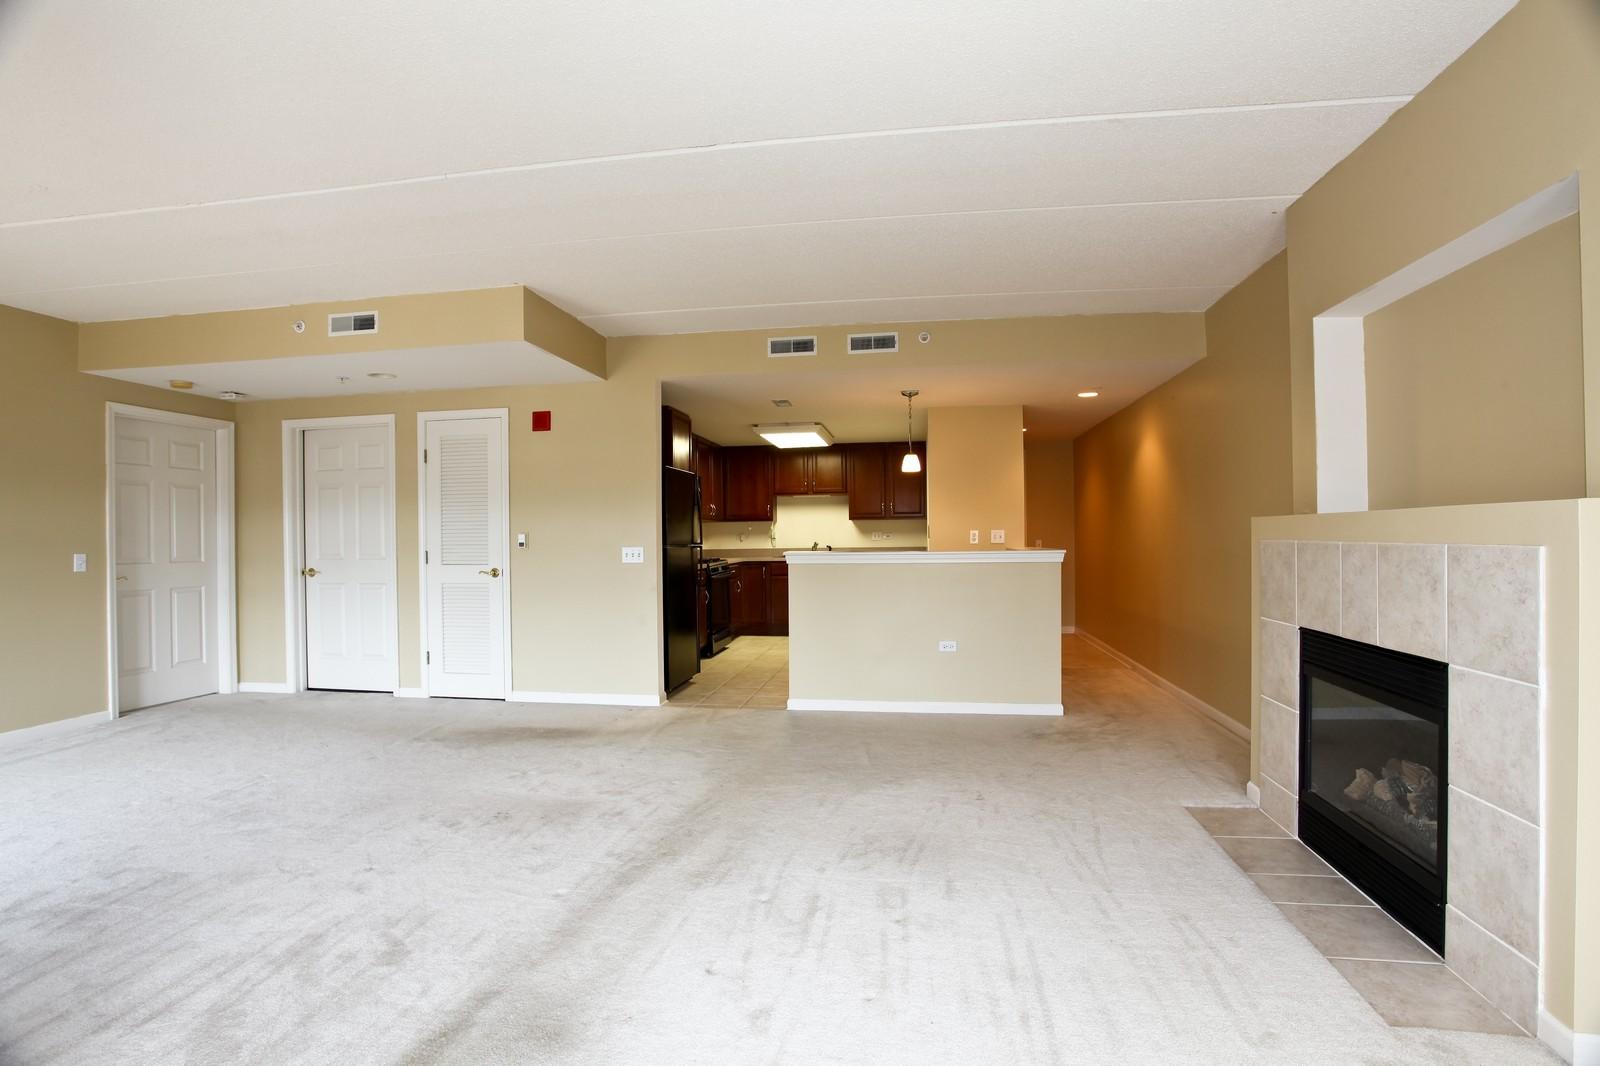 Real Estate Photography - 570 Crescent Blvd., 301, Glen Ellyn, IL, 60137 - Living Room / Dining Room